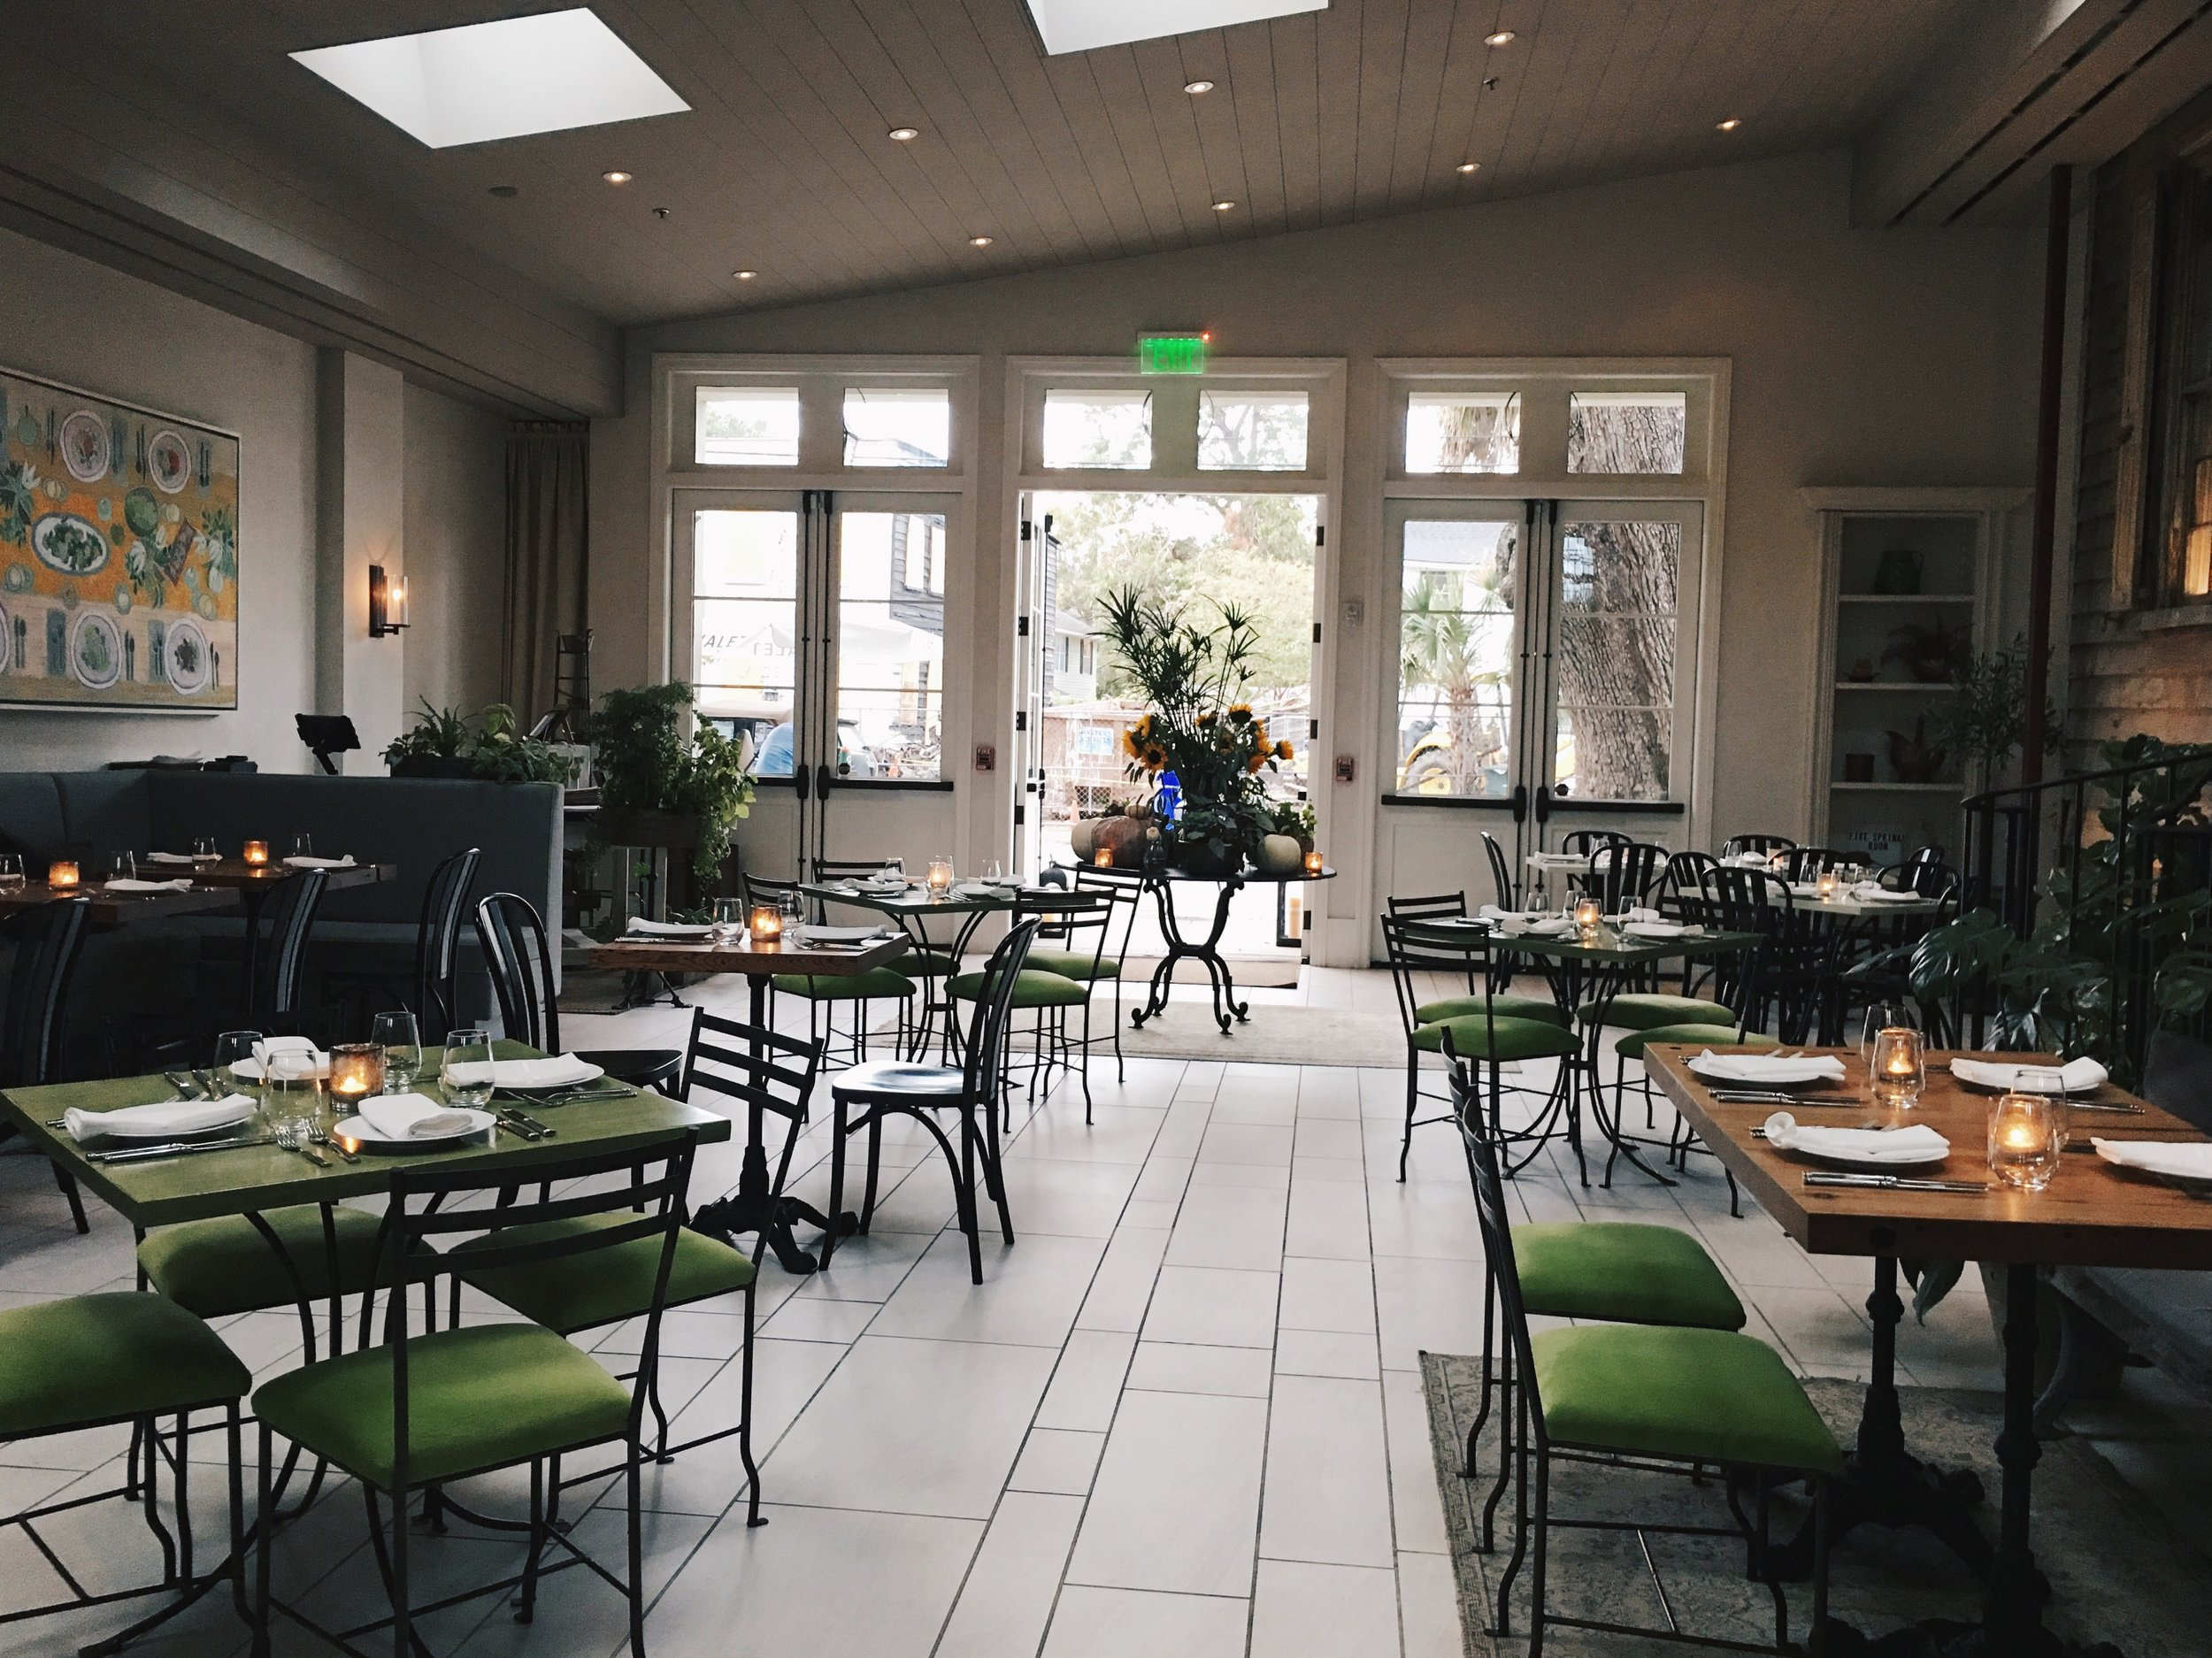 Julia Friedman's photo of the interior of Canon Green Restaurant in Charleston, South Carolina.